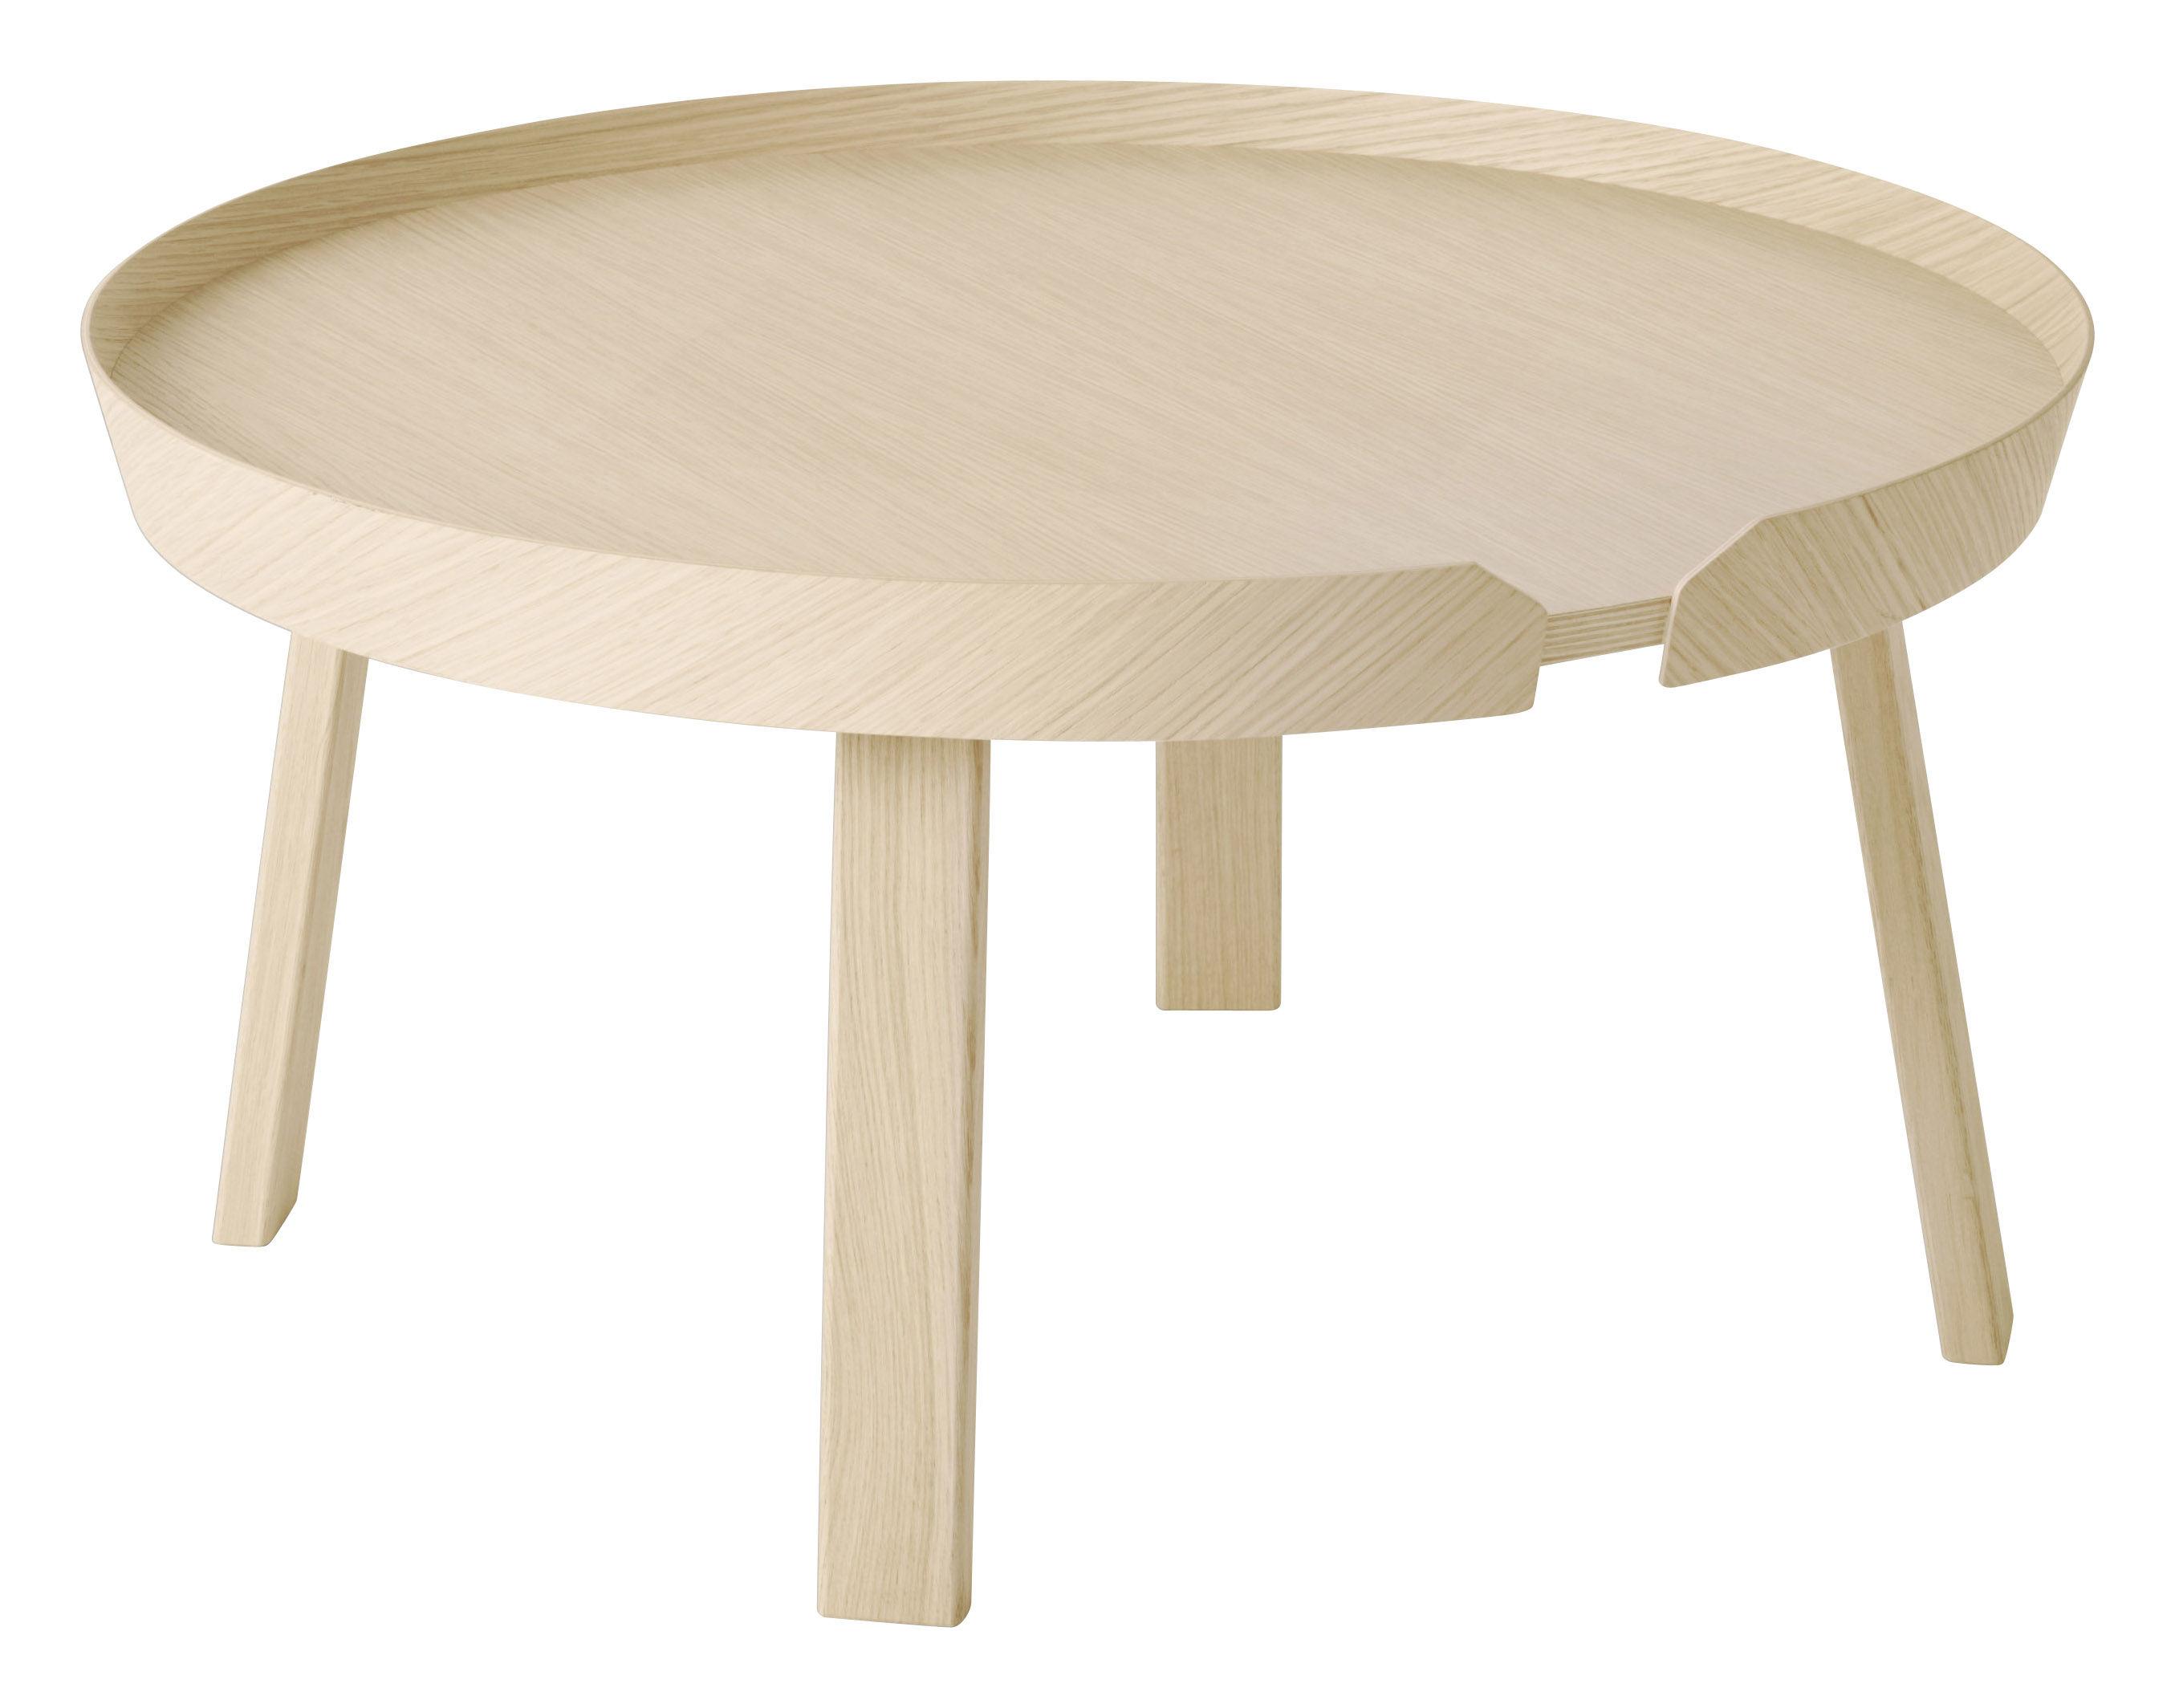 Arredamento - Tavolini  - Tavolino Around - Large Ø 72 x A 37,5 cm di Muuto - Frassino naturale - Frassino